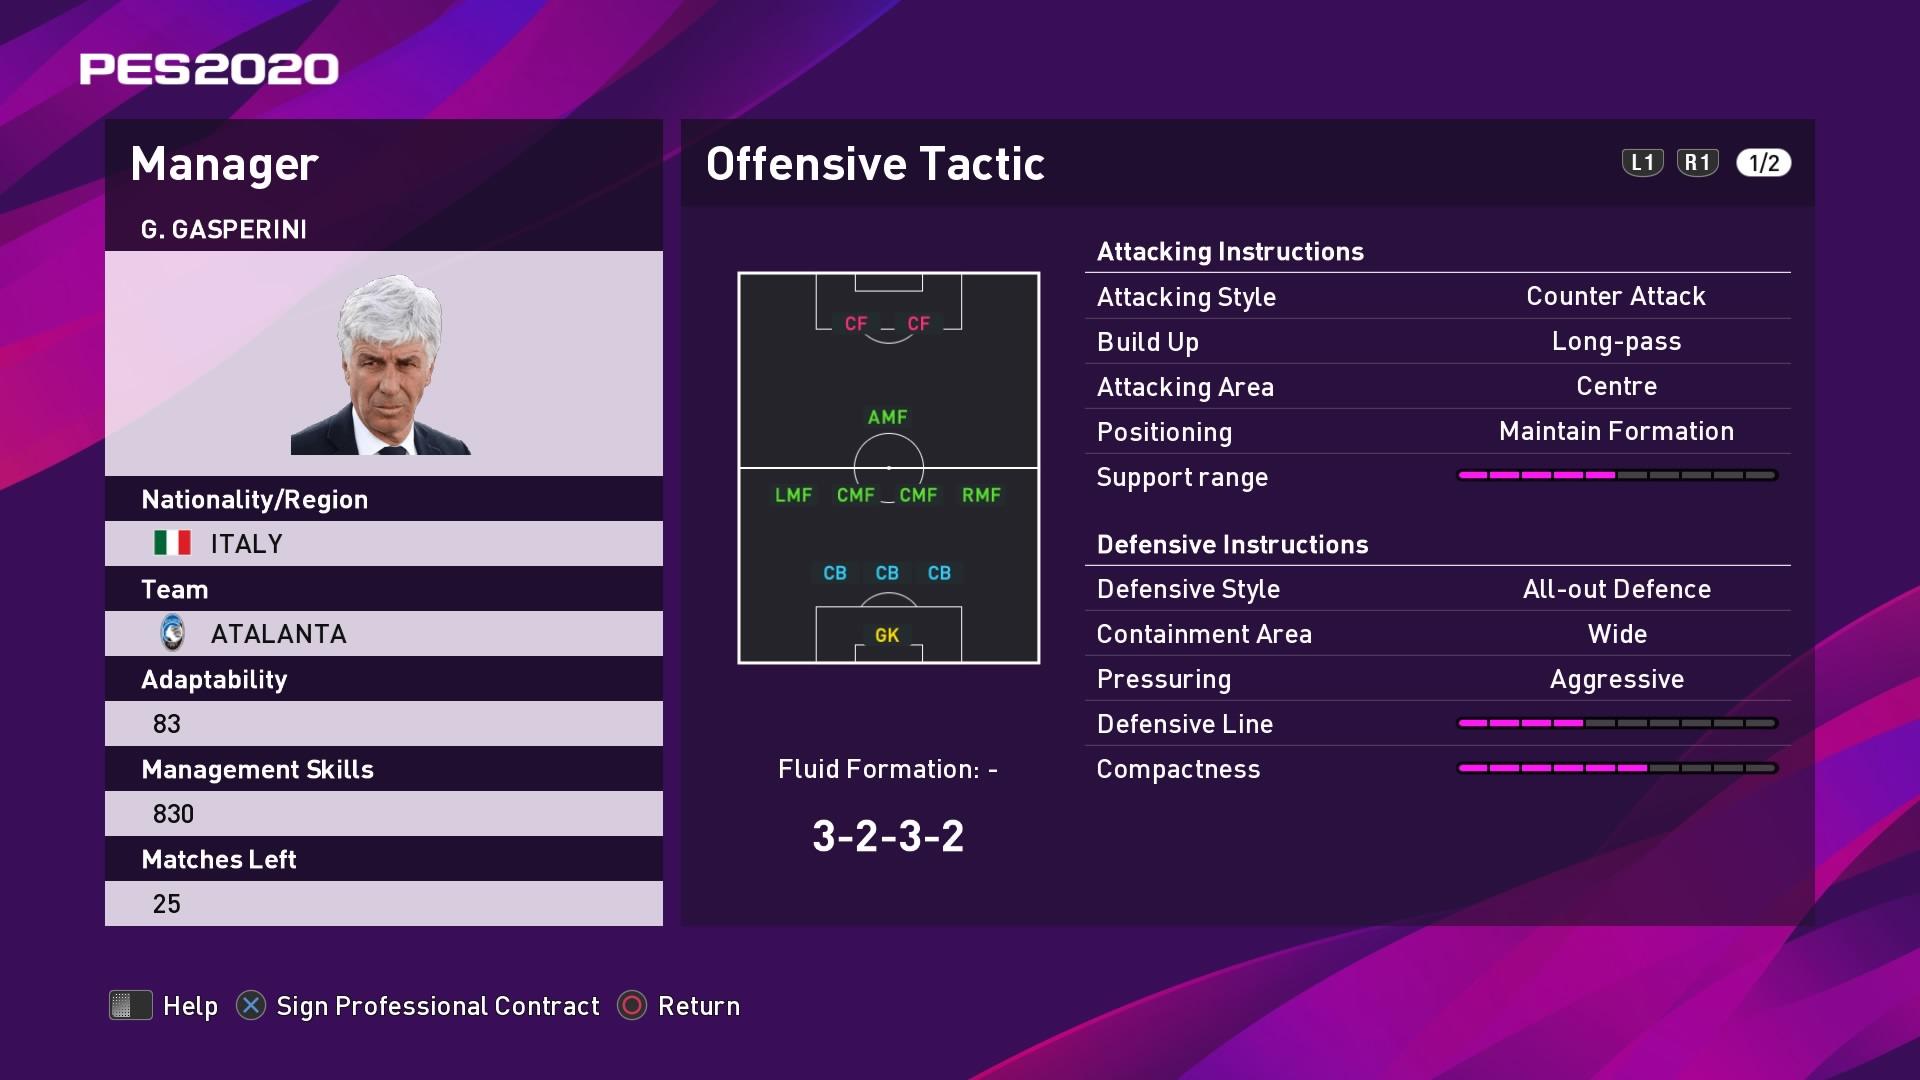 G. Gasperini (3) (Gian Piero Gasperini) Offensive Tactic in PES 2020 myClub